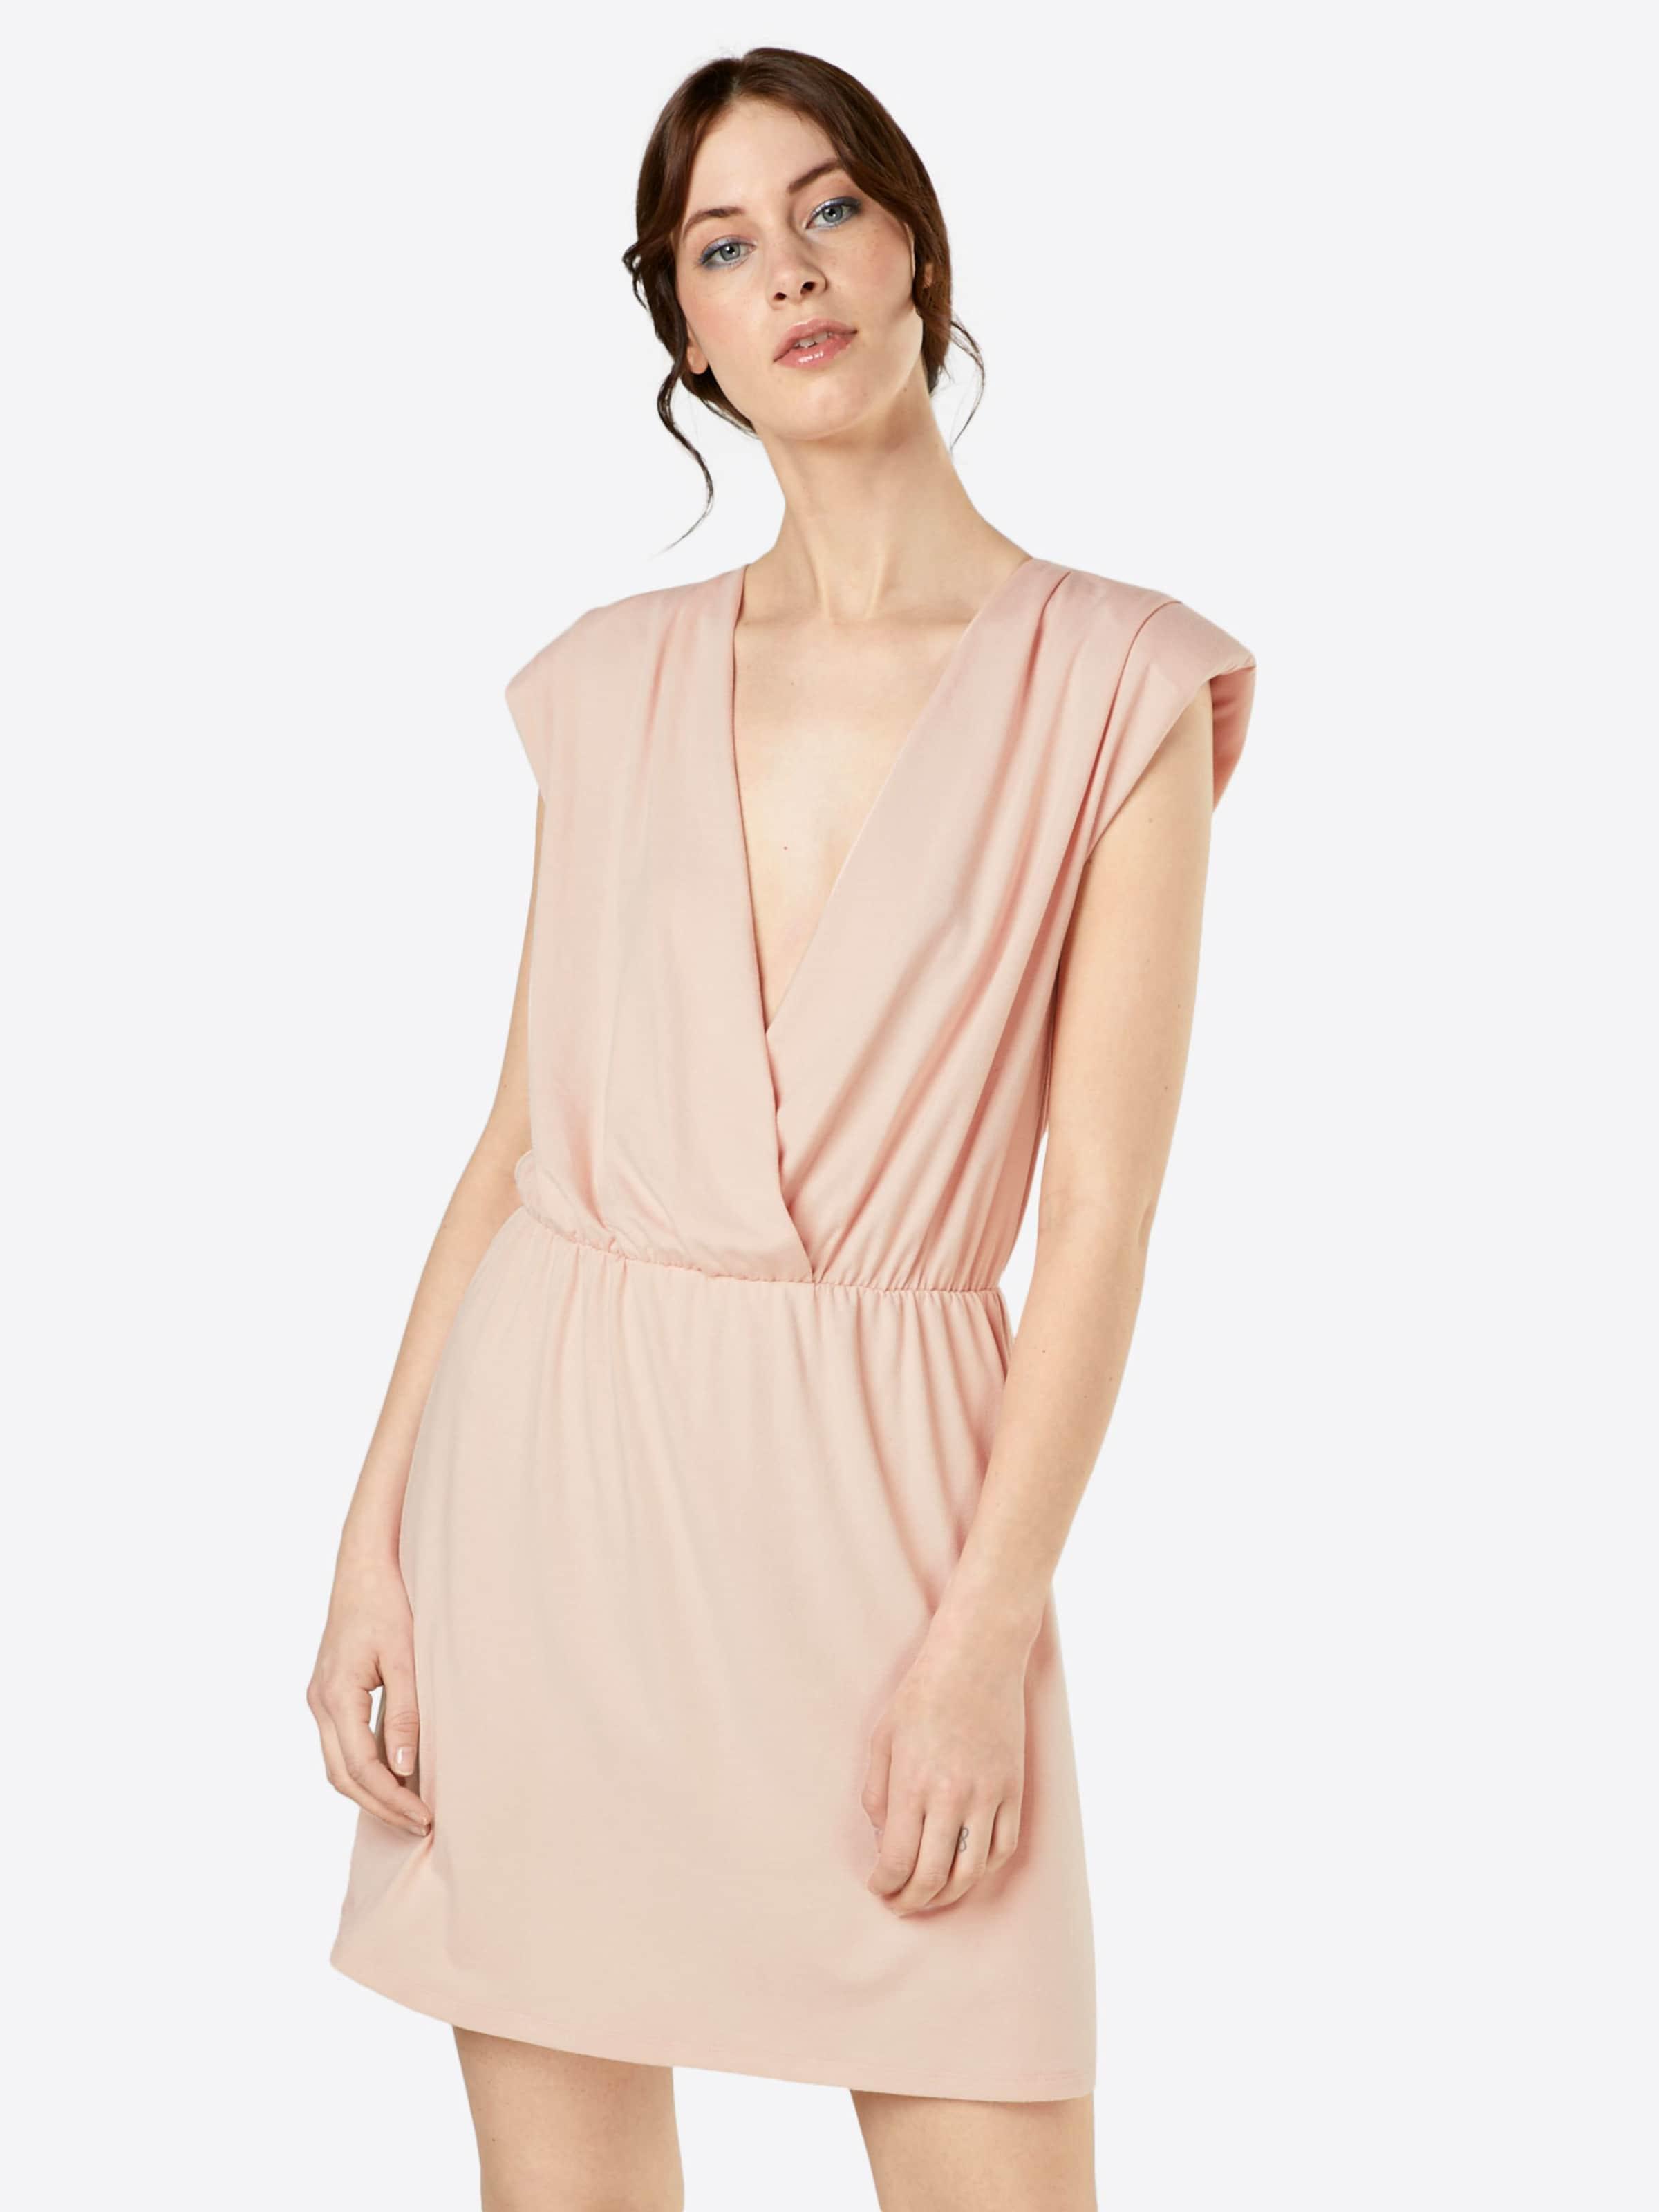 Kleid In Rosa Ivyrevel 'simone' Kleid 'simone' In In Kleid Ivyrevel 'simone' Rosa Ivyrevel oErxQeBdCW